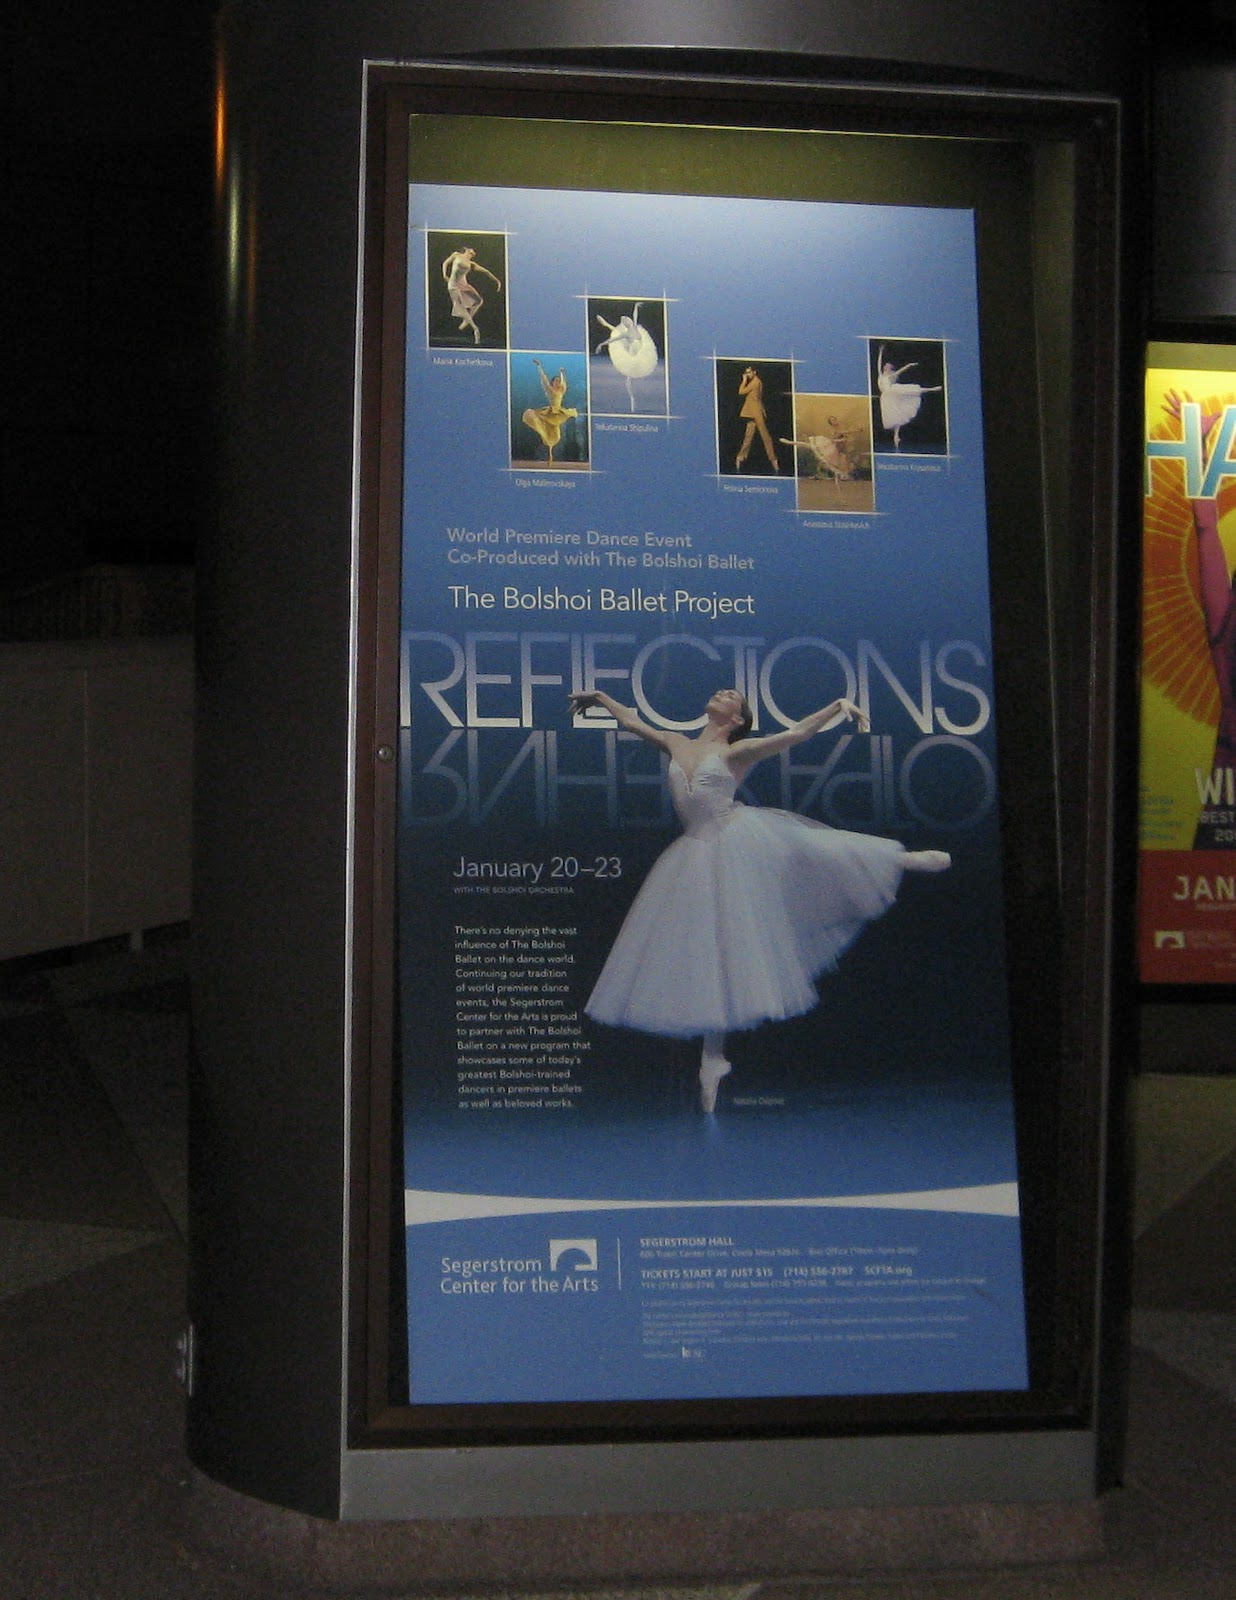 http://2.bp.blogspot.com/_TNrLycoeAgw/TTt45a3SFcI/AAAAAAAAABs/Ta8_XbzXFIo/s1600/Reflections.JPG